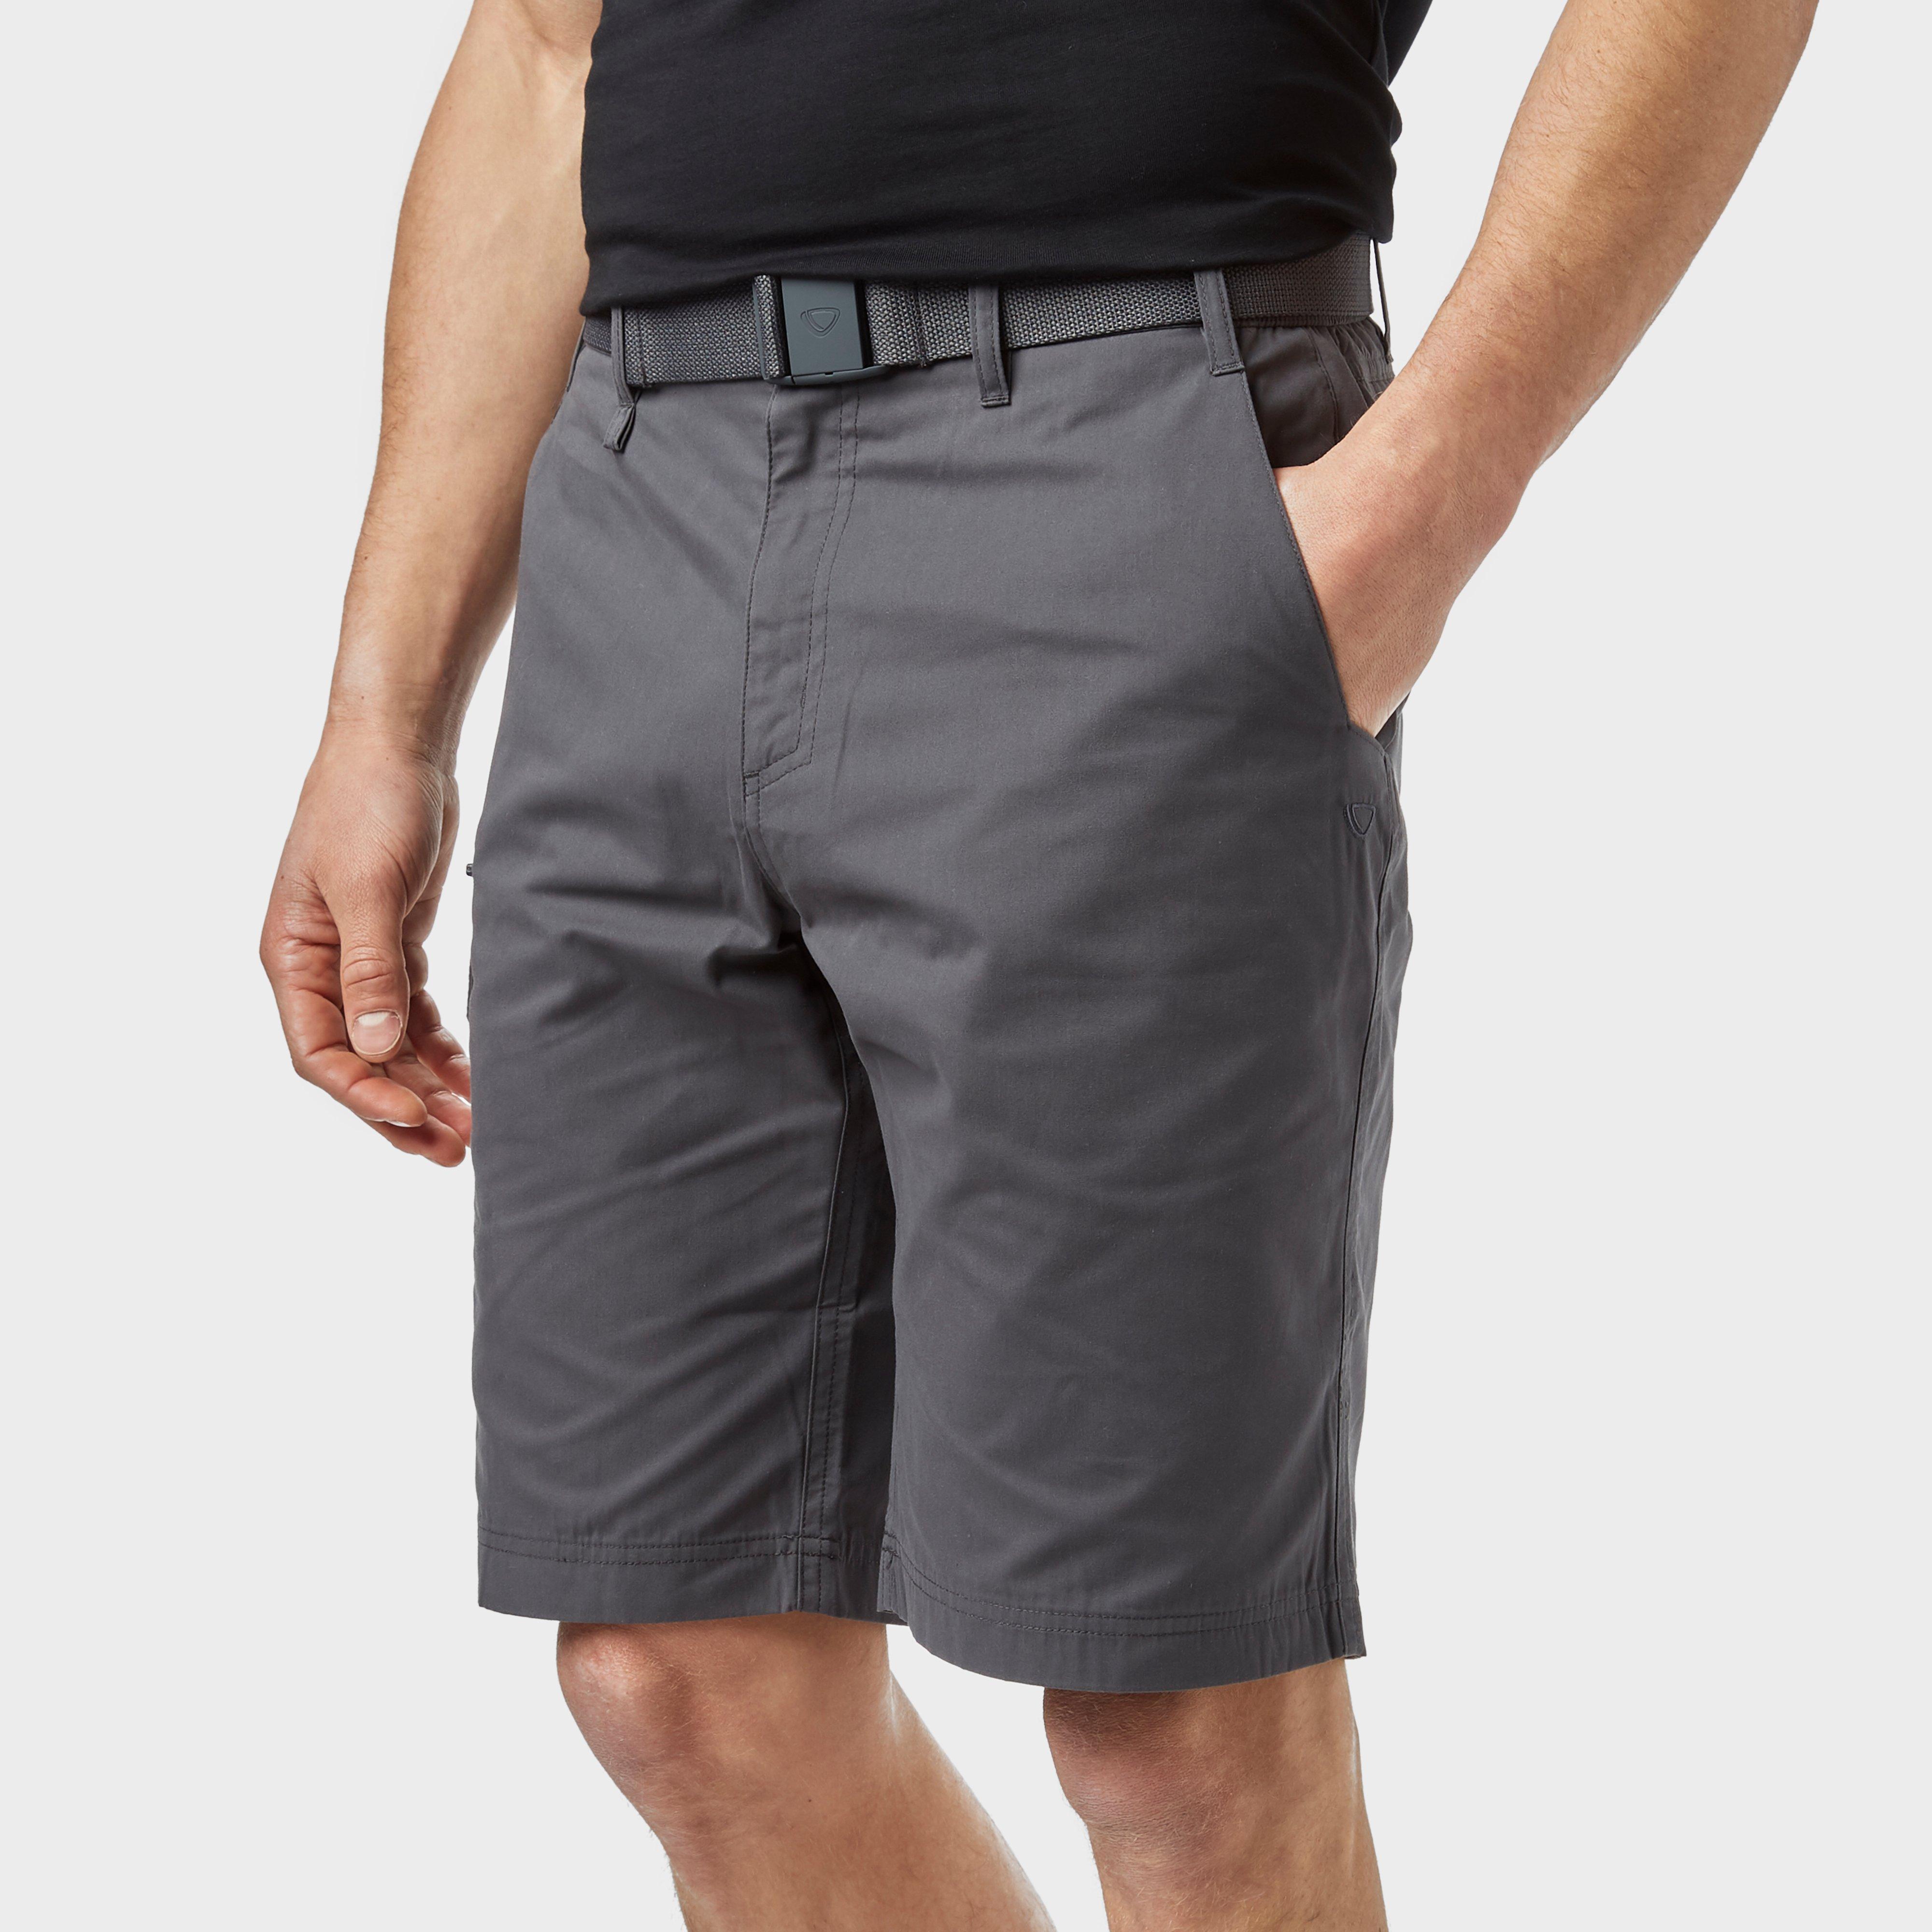 Brasher Men's Shorts, Grey/MGY